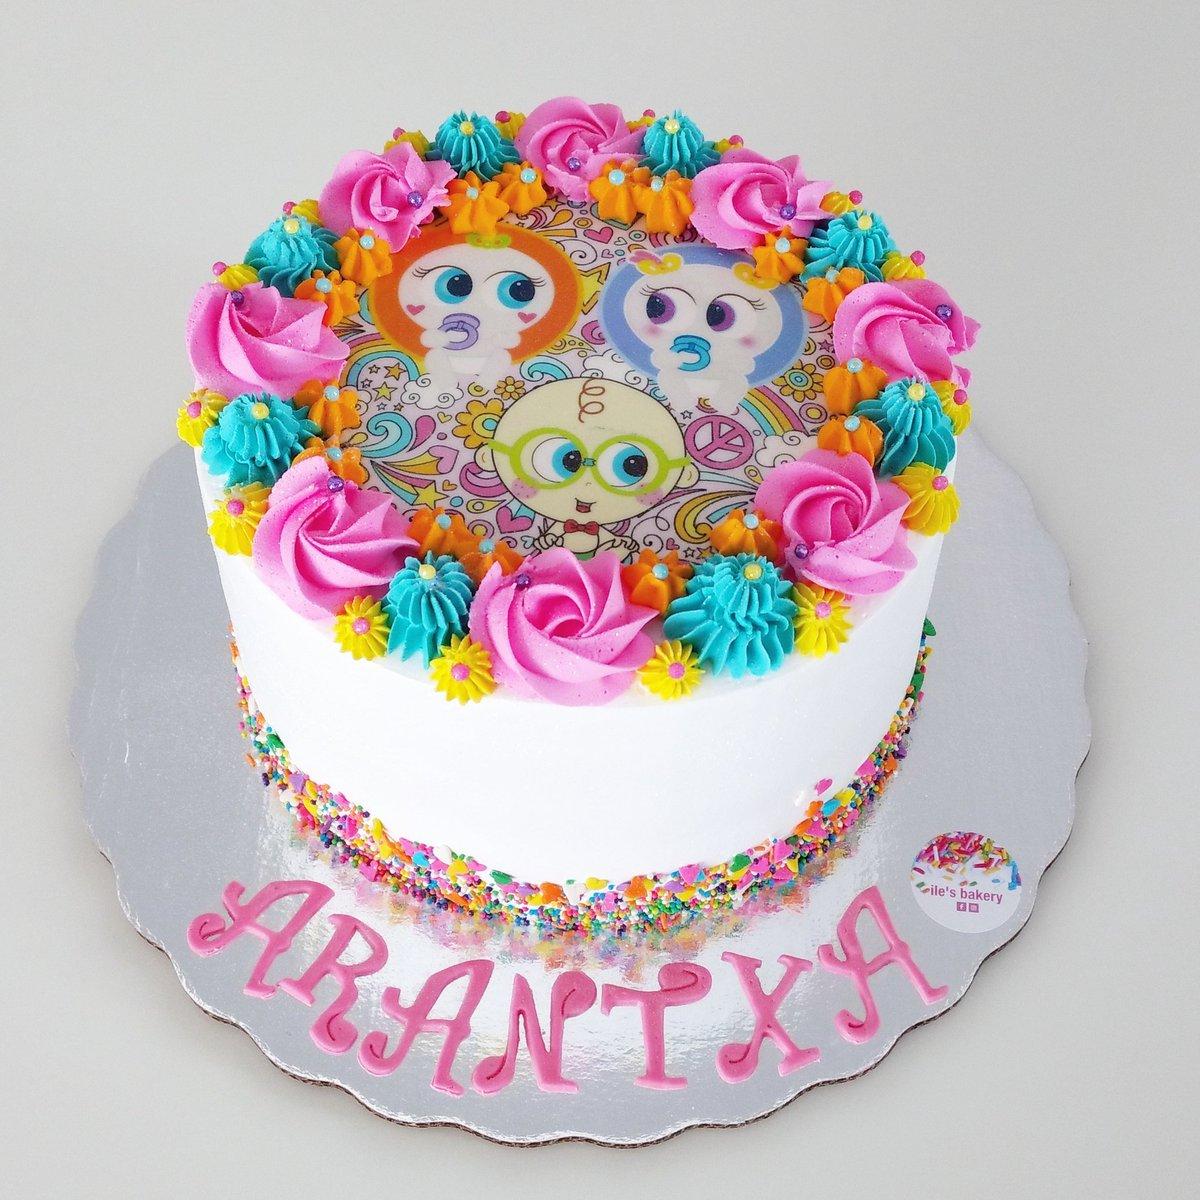 Ile S Bakery On Twitter Feliz Cumpleanos Aranchi Gracias